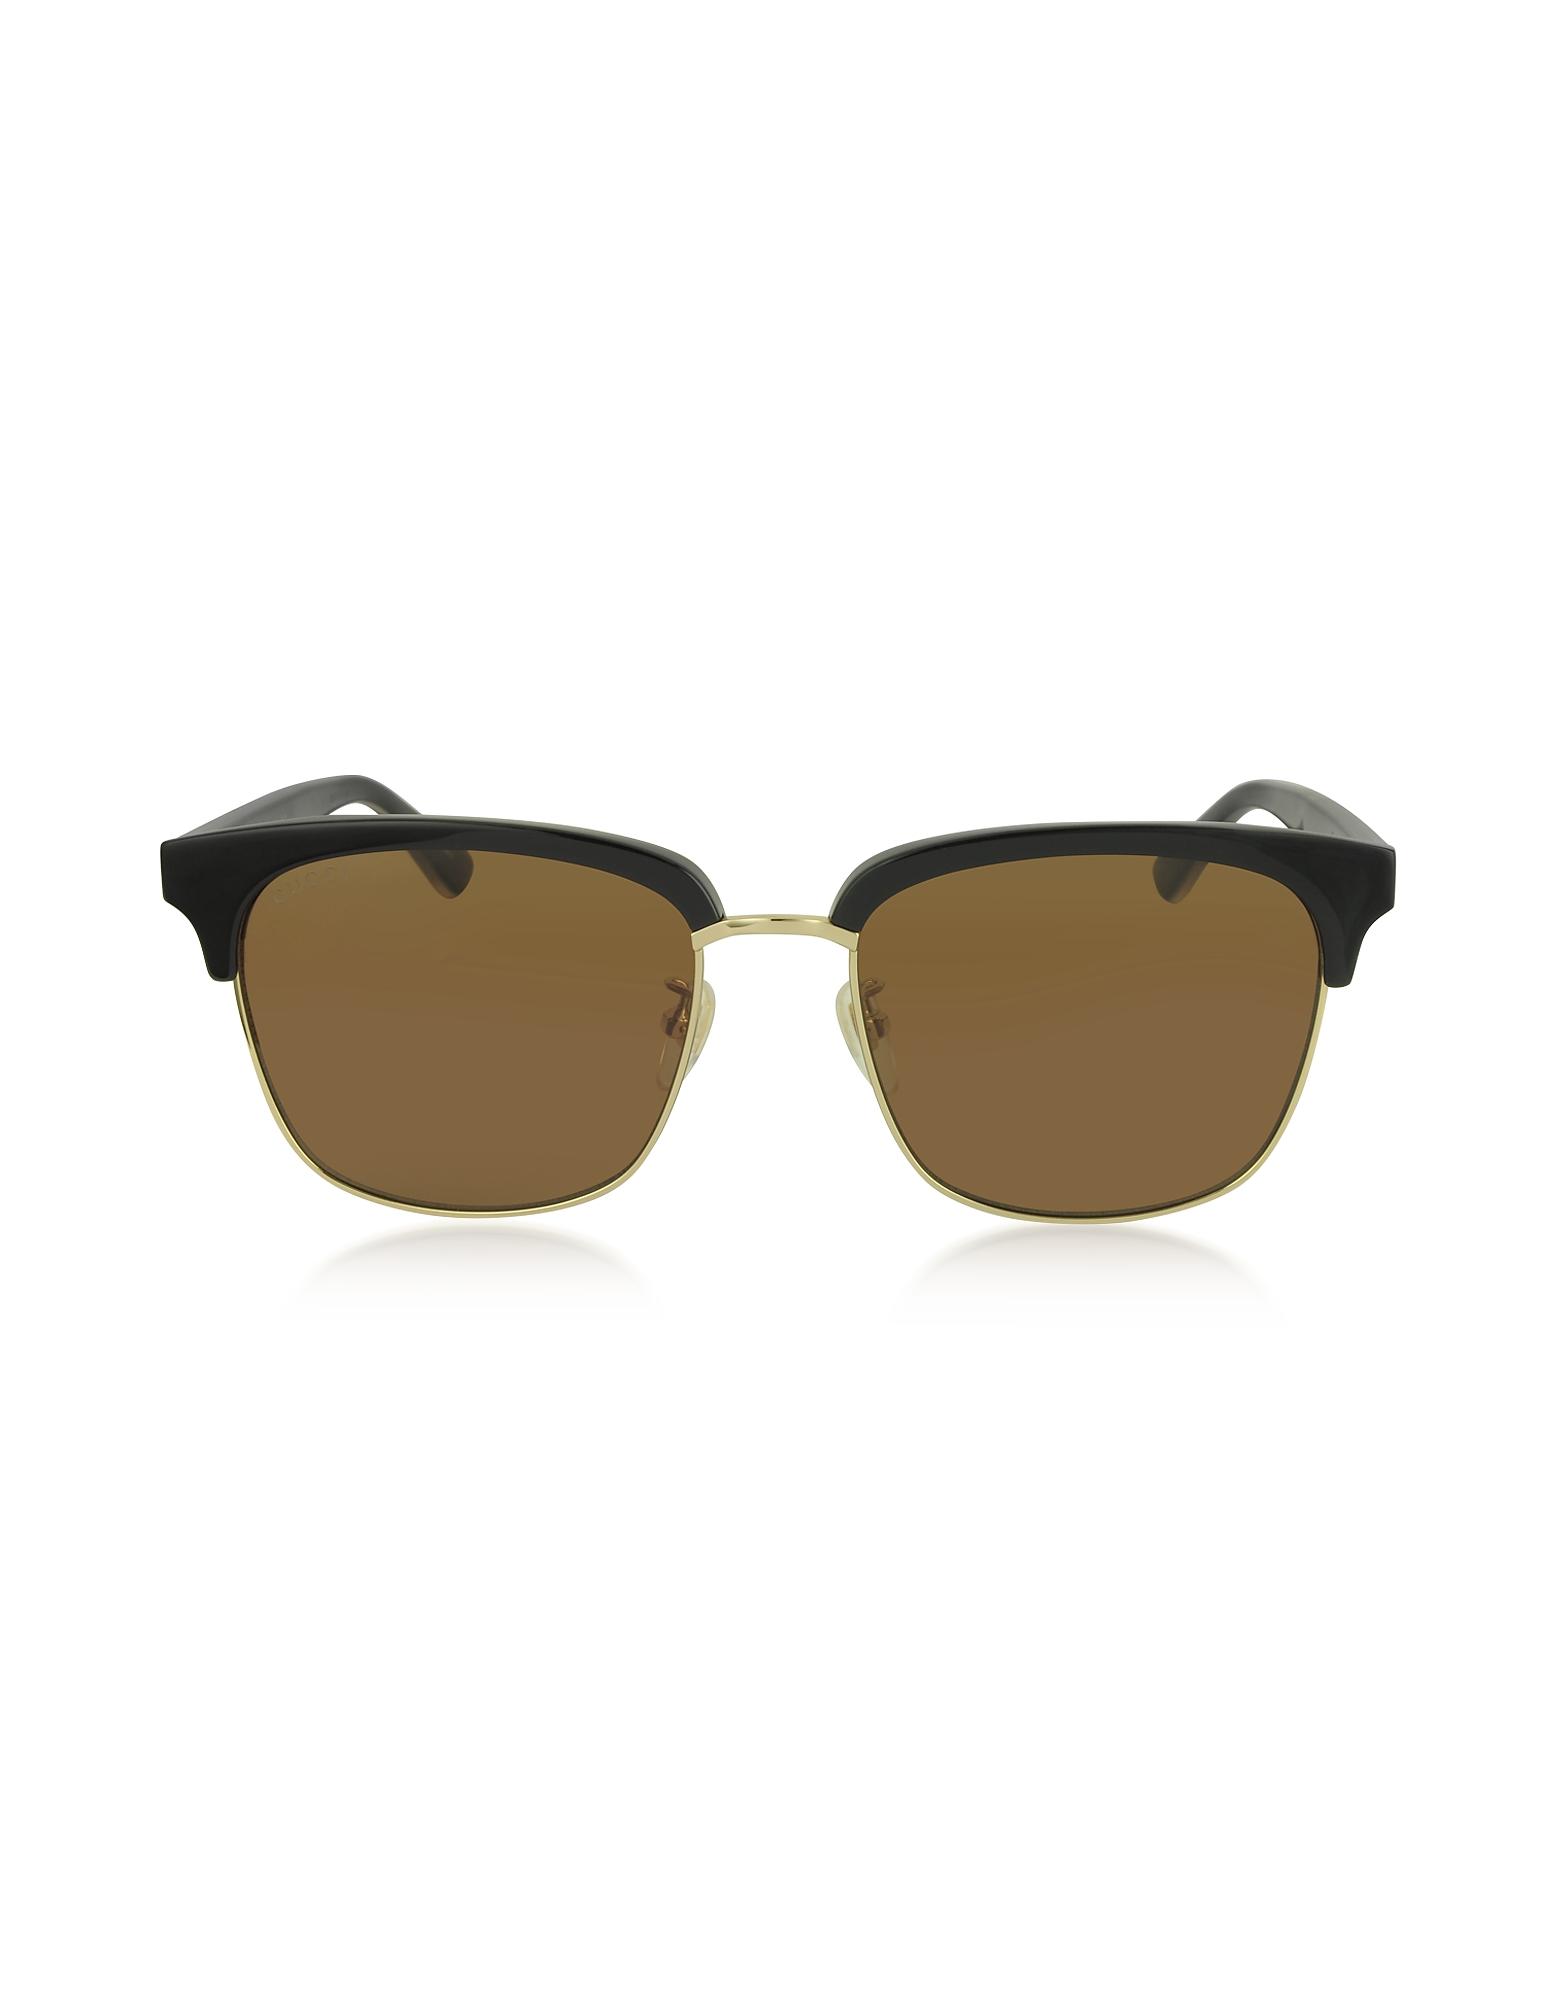 Gucci Designer Sunglasses, Rectangular-frame Metal Sunglasses